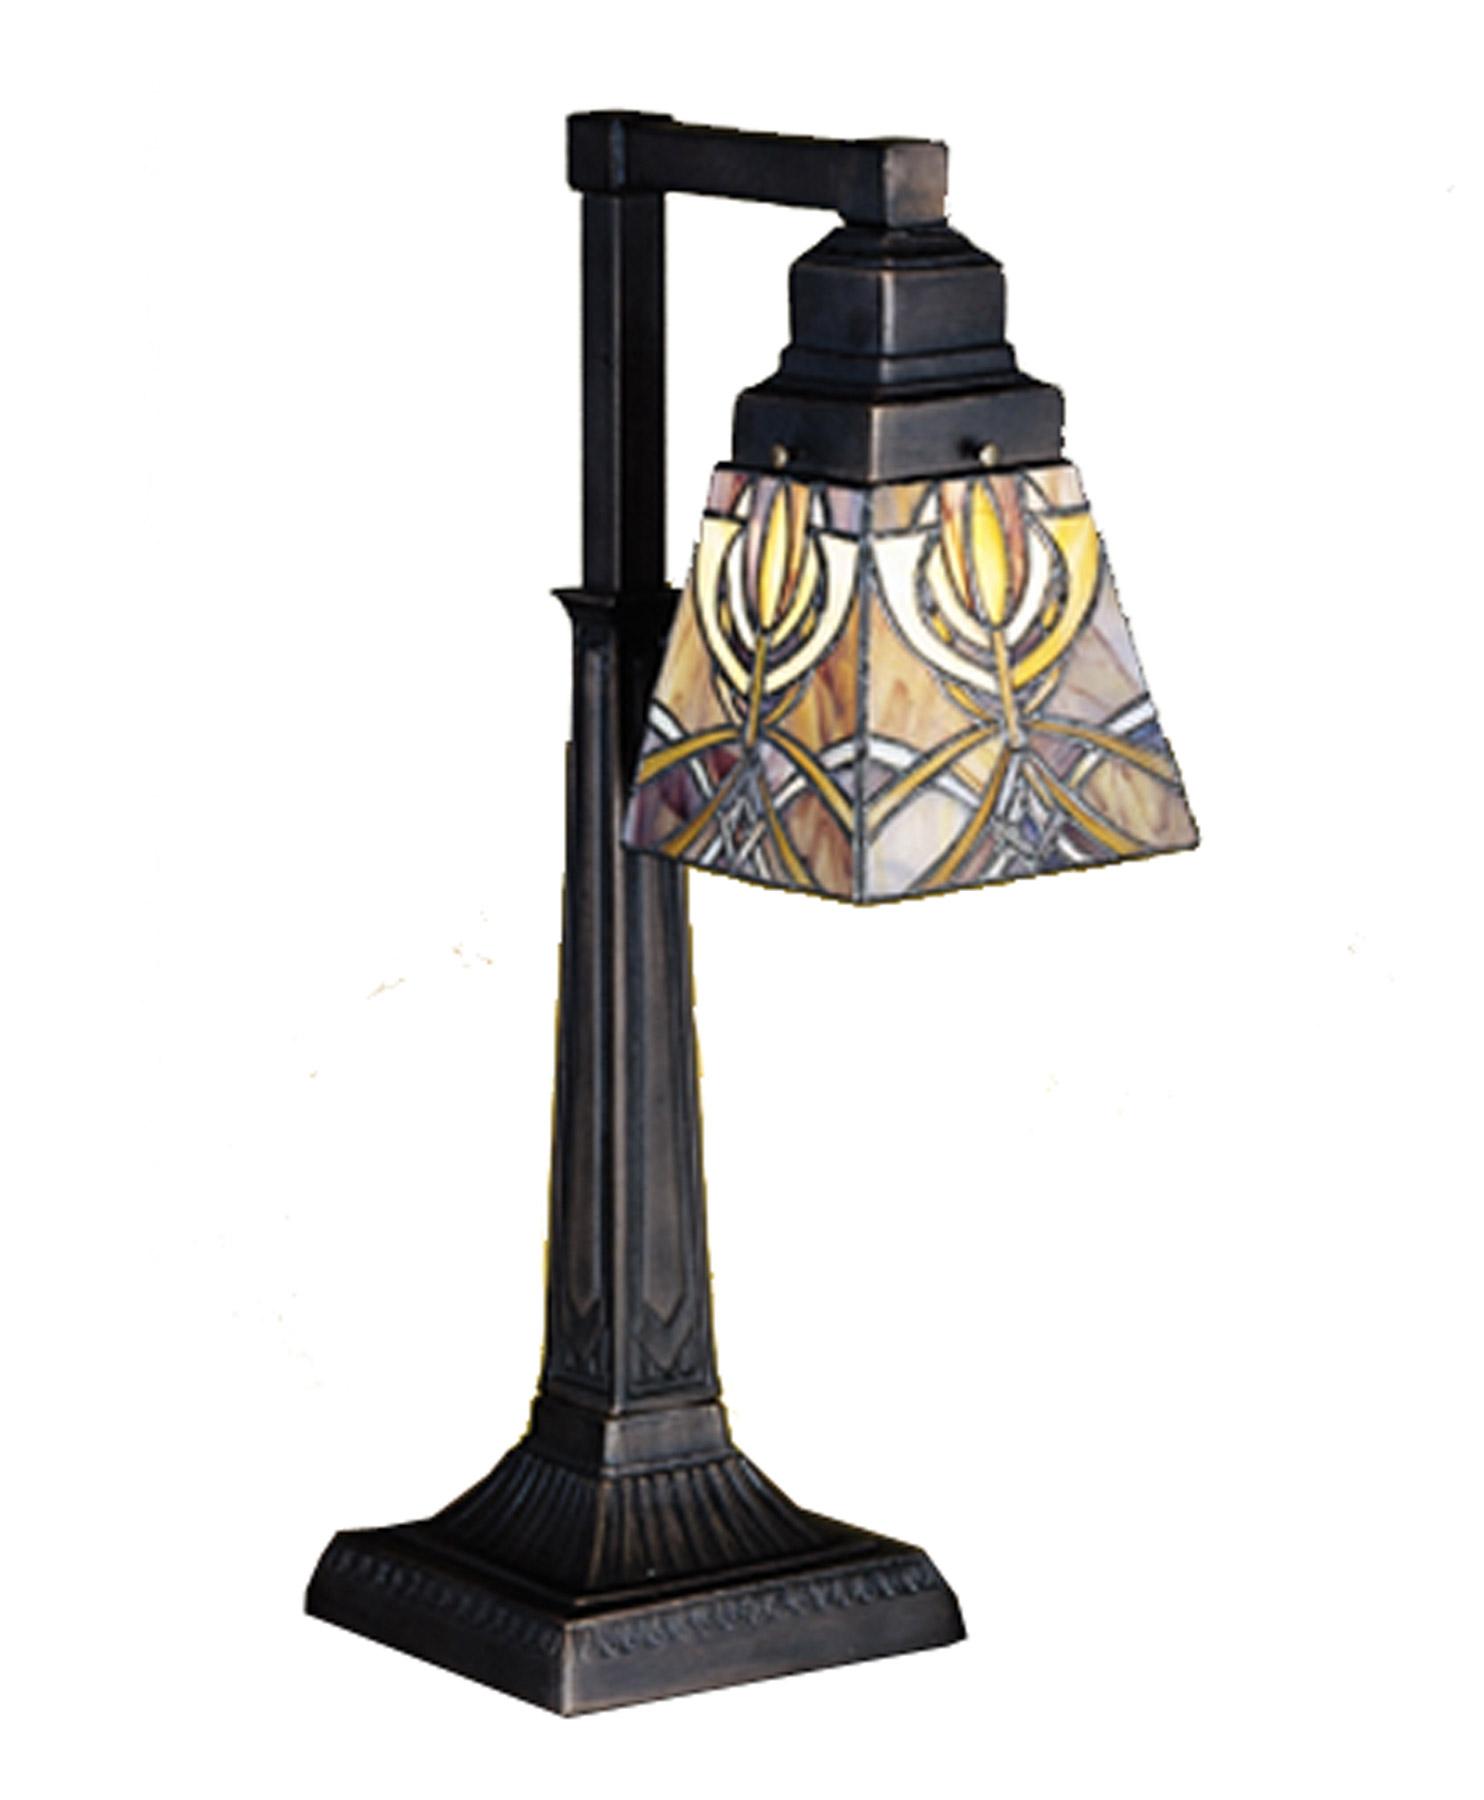 27636 glasgow bungalow desk lamp meyda 27636 glasgow bungalow desk lamp aloadofball Gallery